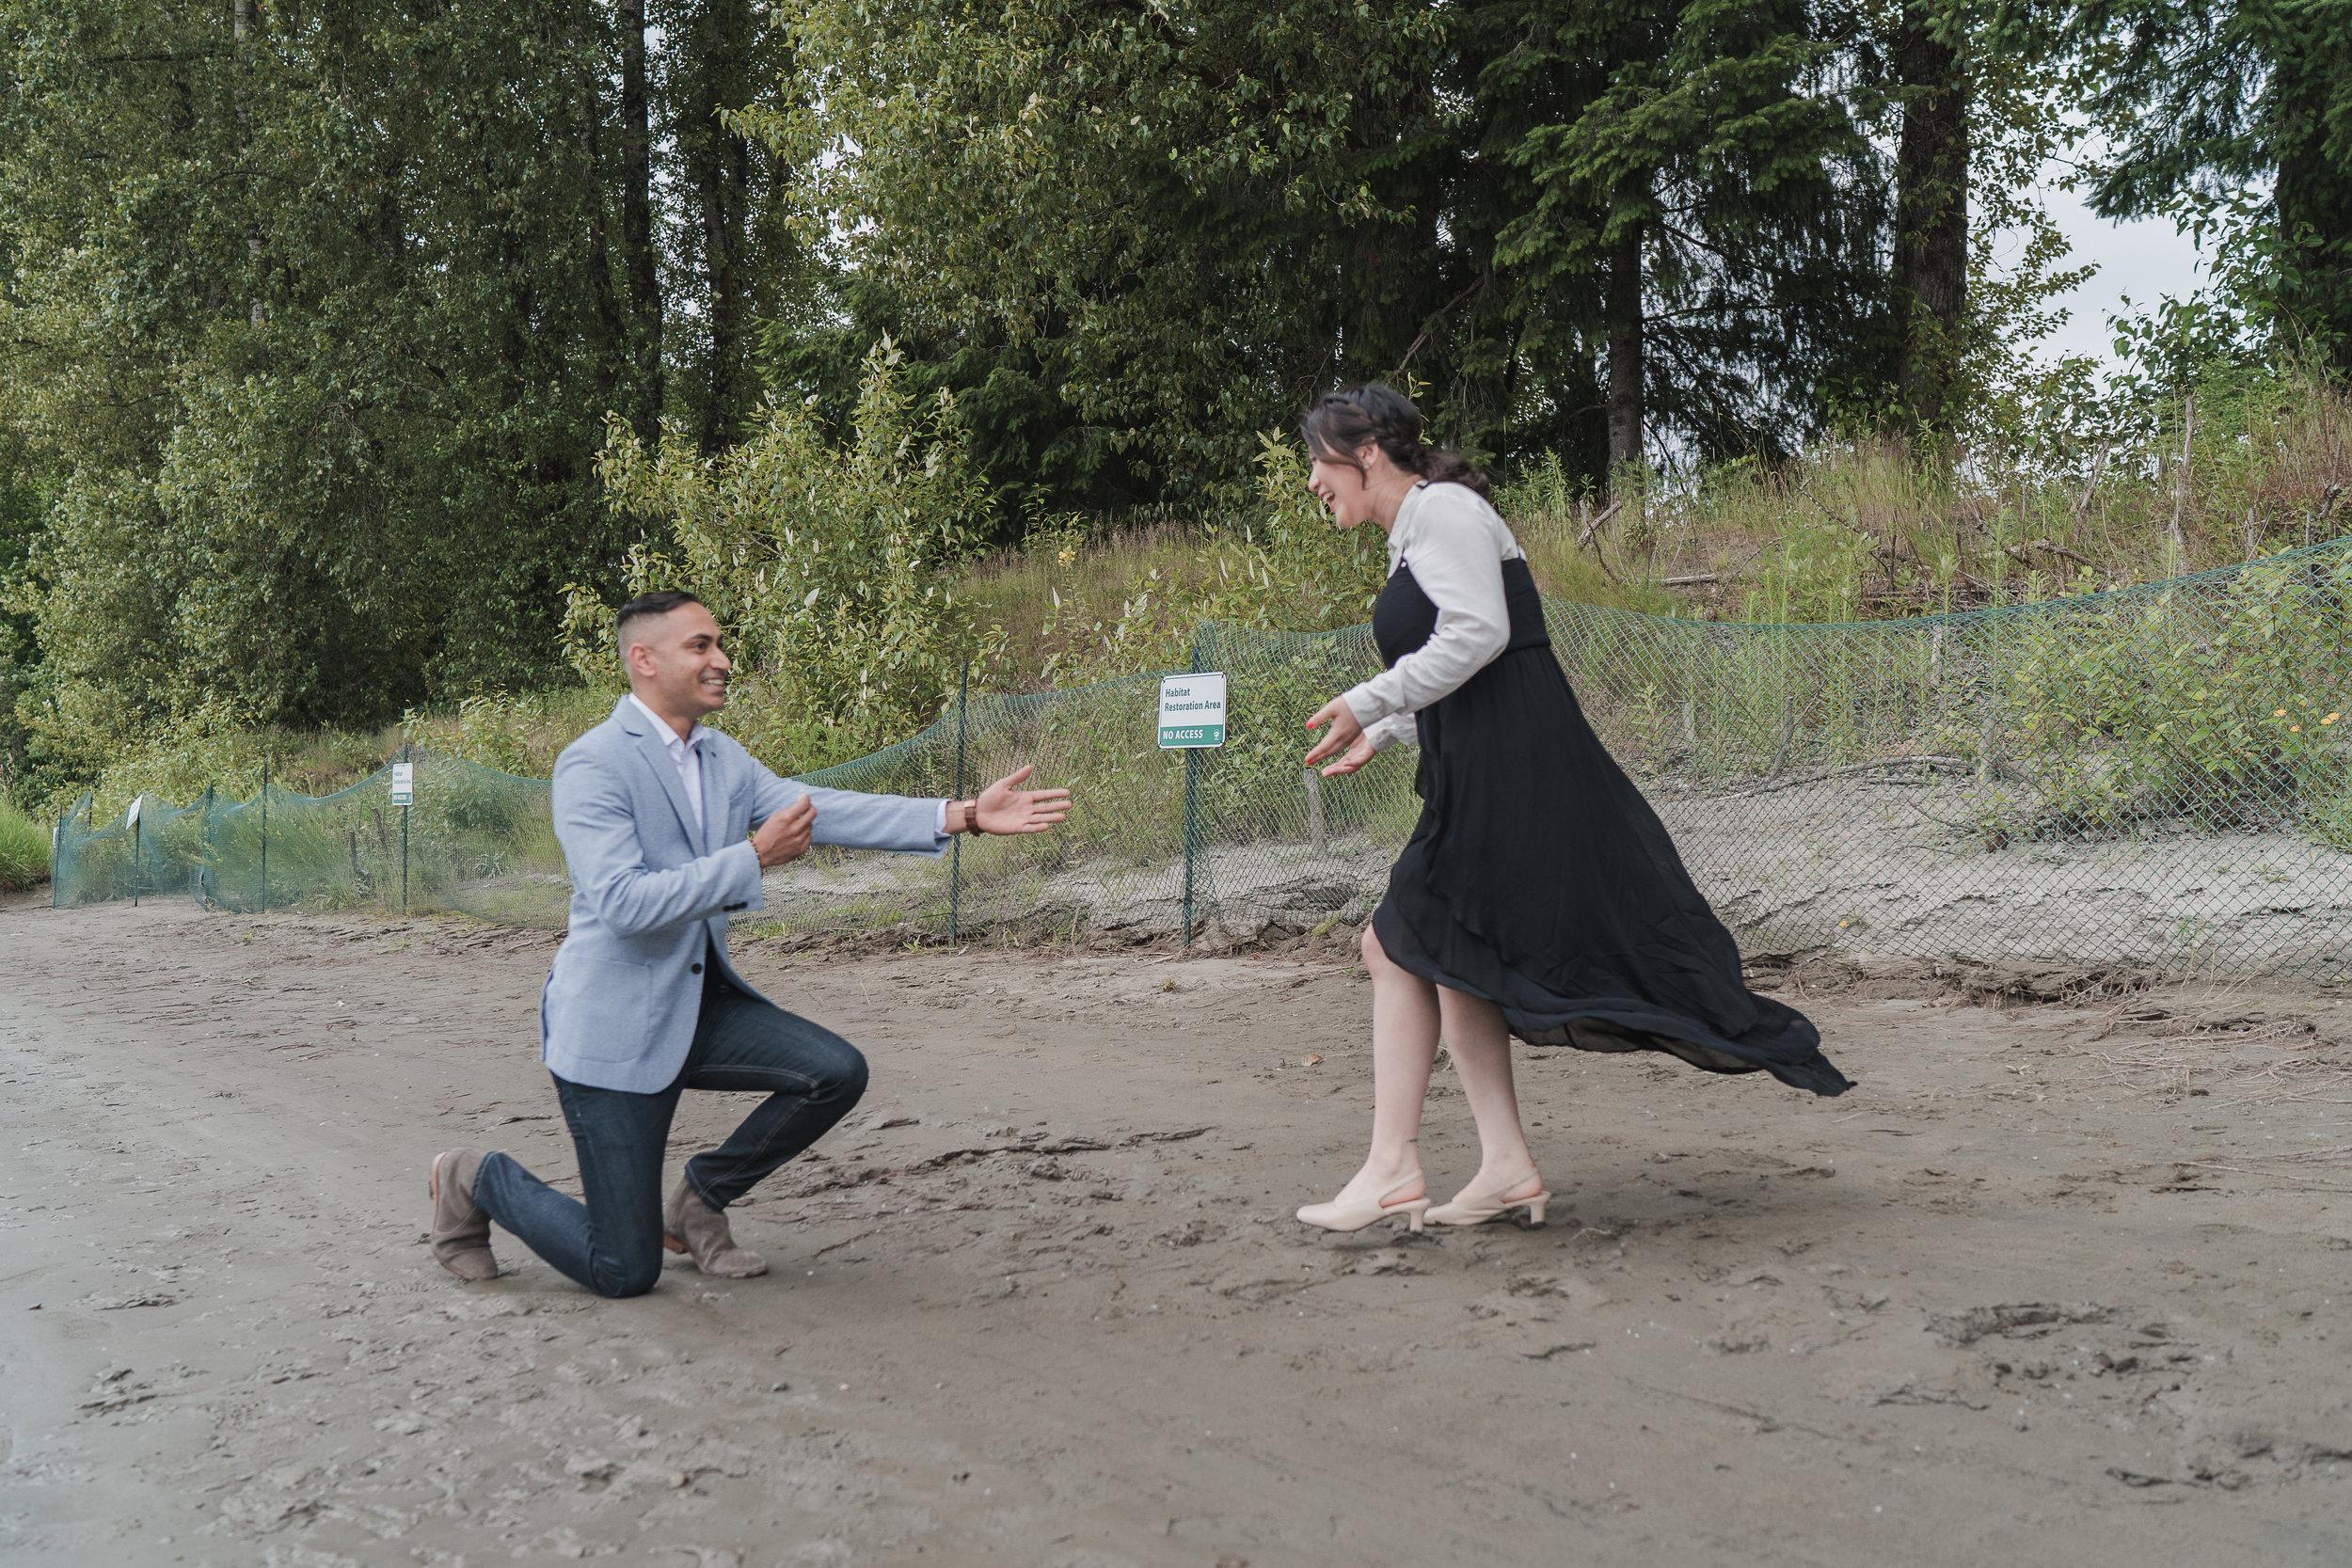 20190622 - Monika & Johnson Engagement- 0029.jpg